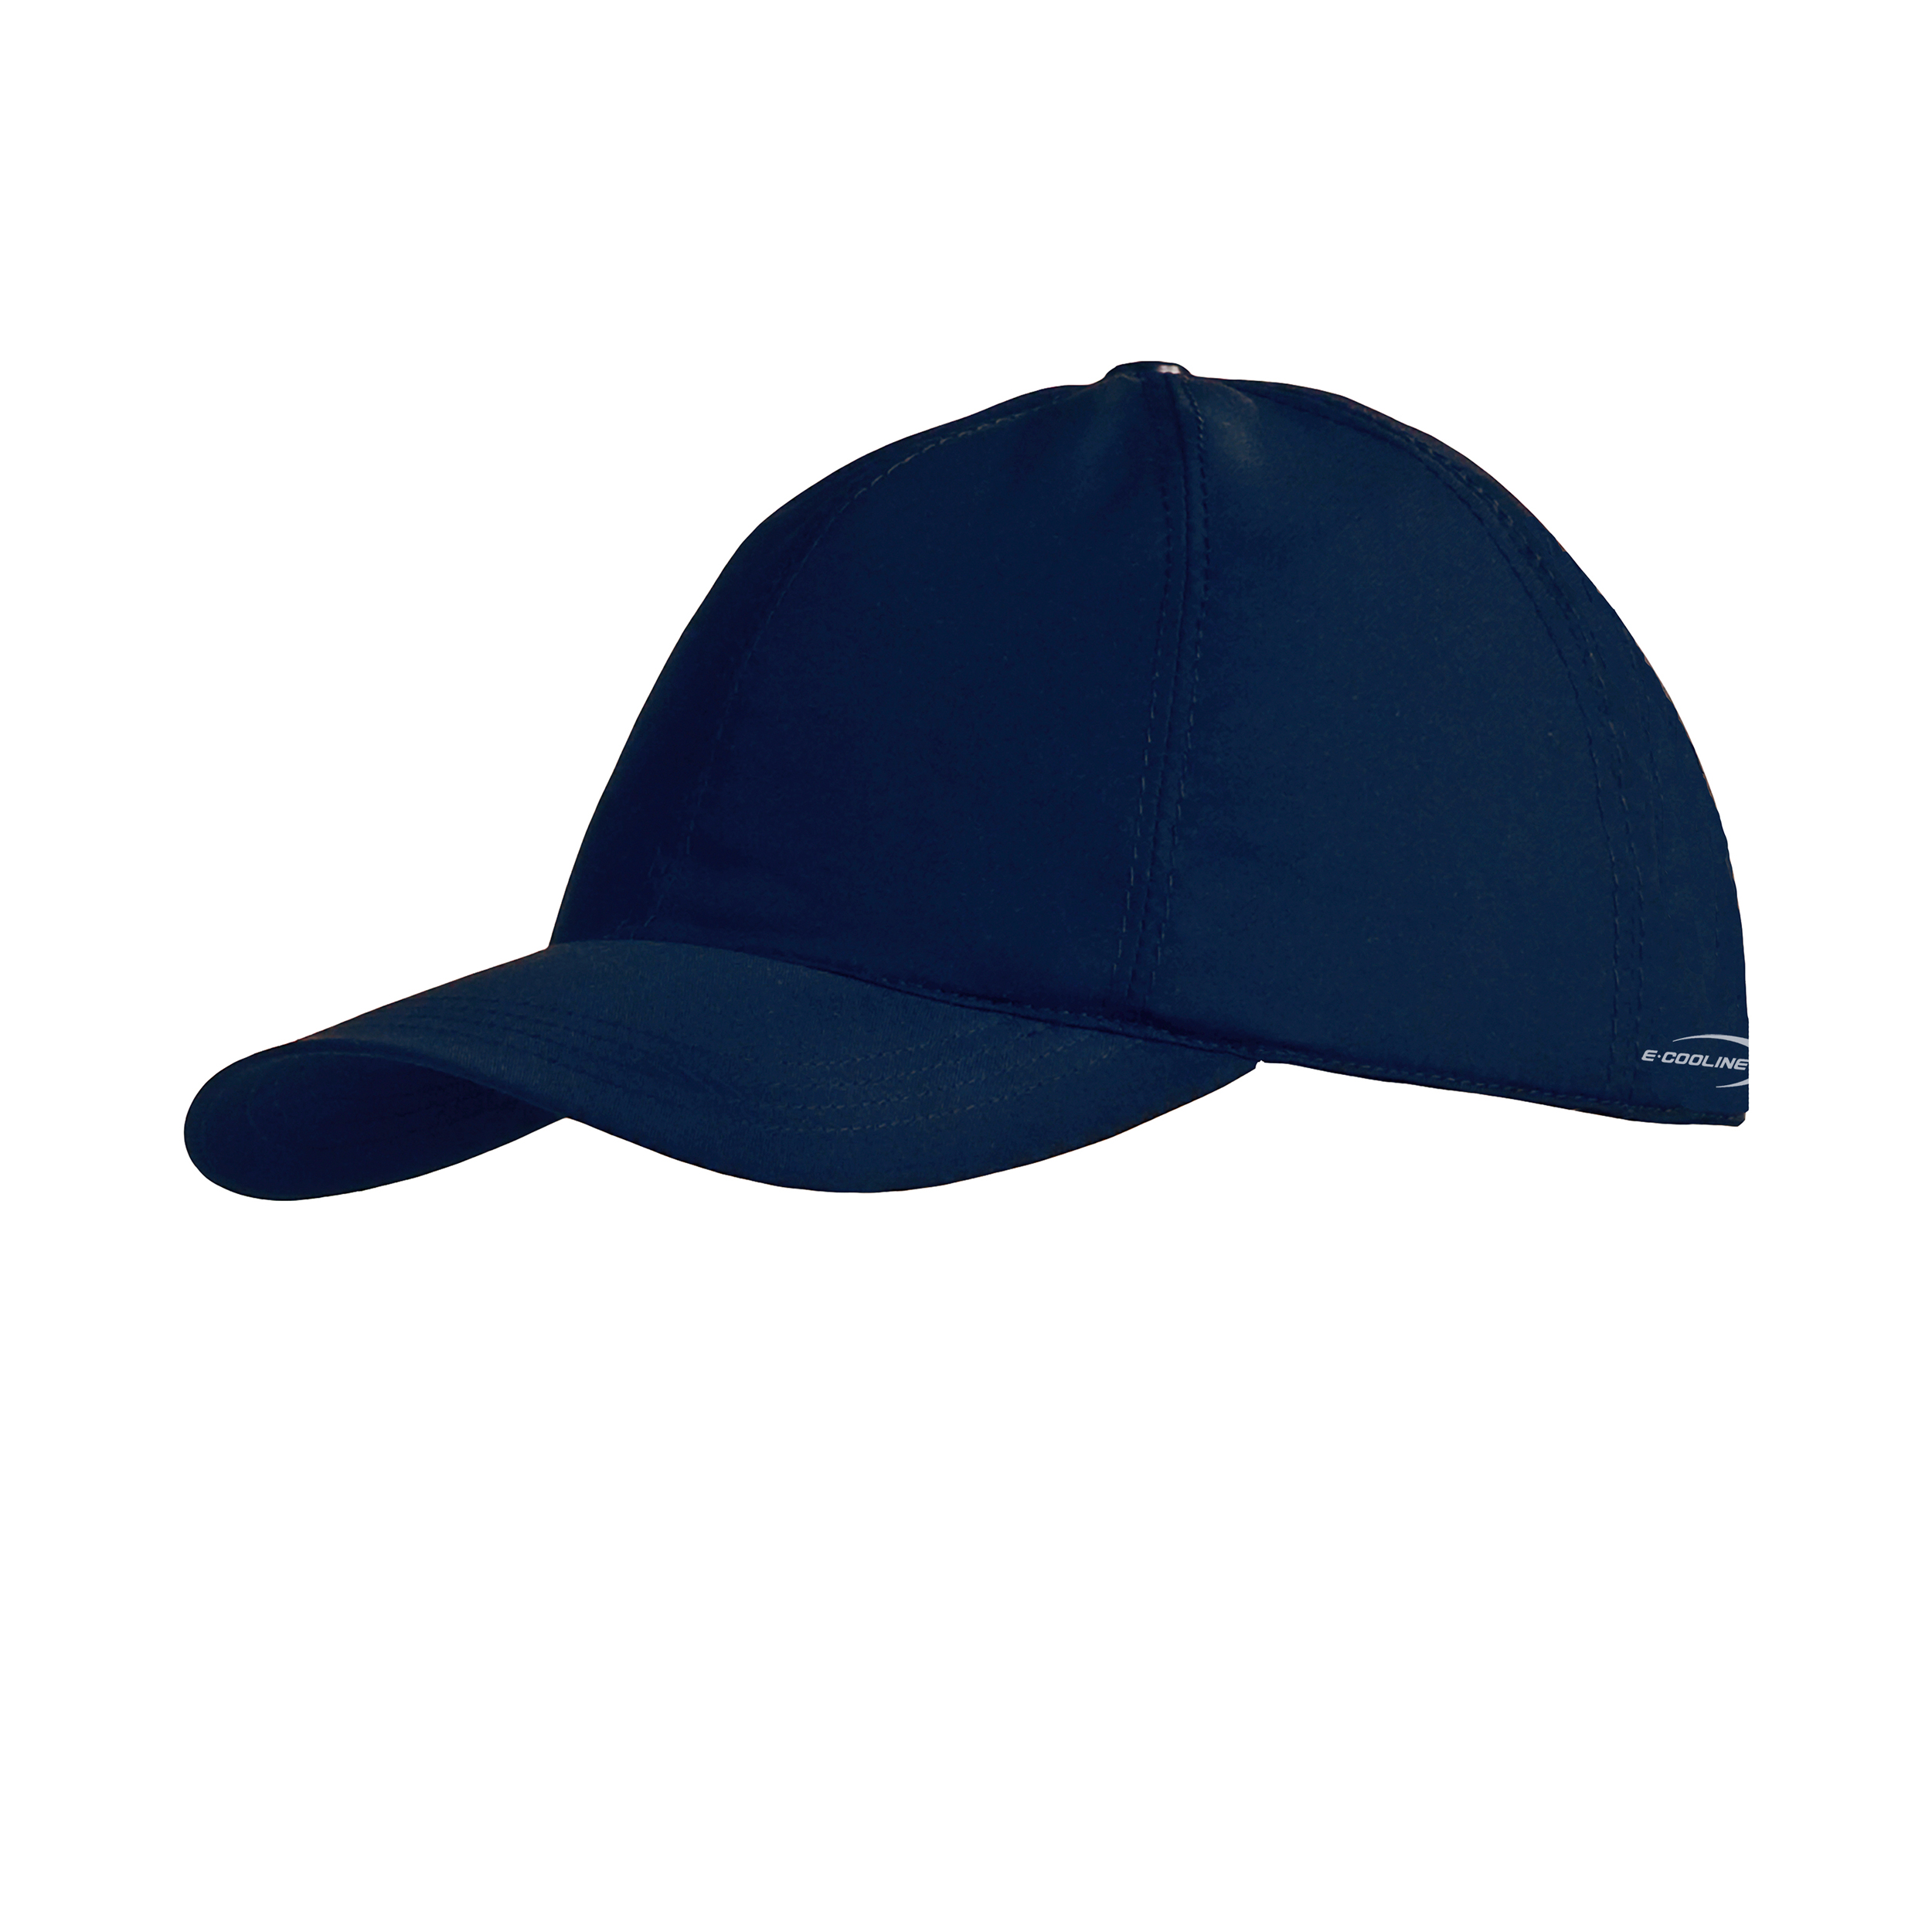 Powercool-SX3-Basecap-blue Powercool-SX3-Basecap-blue